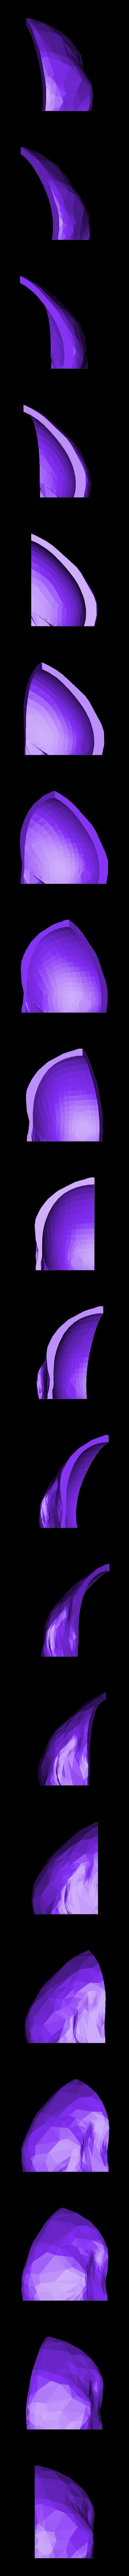 skull_main_V2_iris_goggles_repaired_Cut_2_Cut_2_Cut_2.stl Download free STL file Steampunk Skull helmet V2 • 3D printer design, cube606592